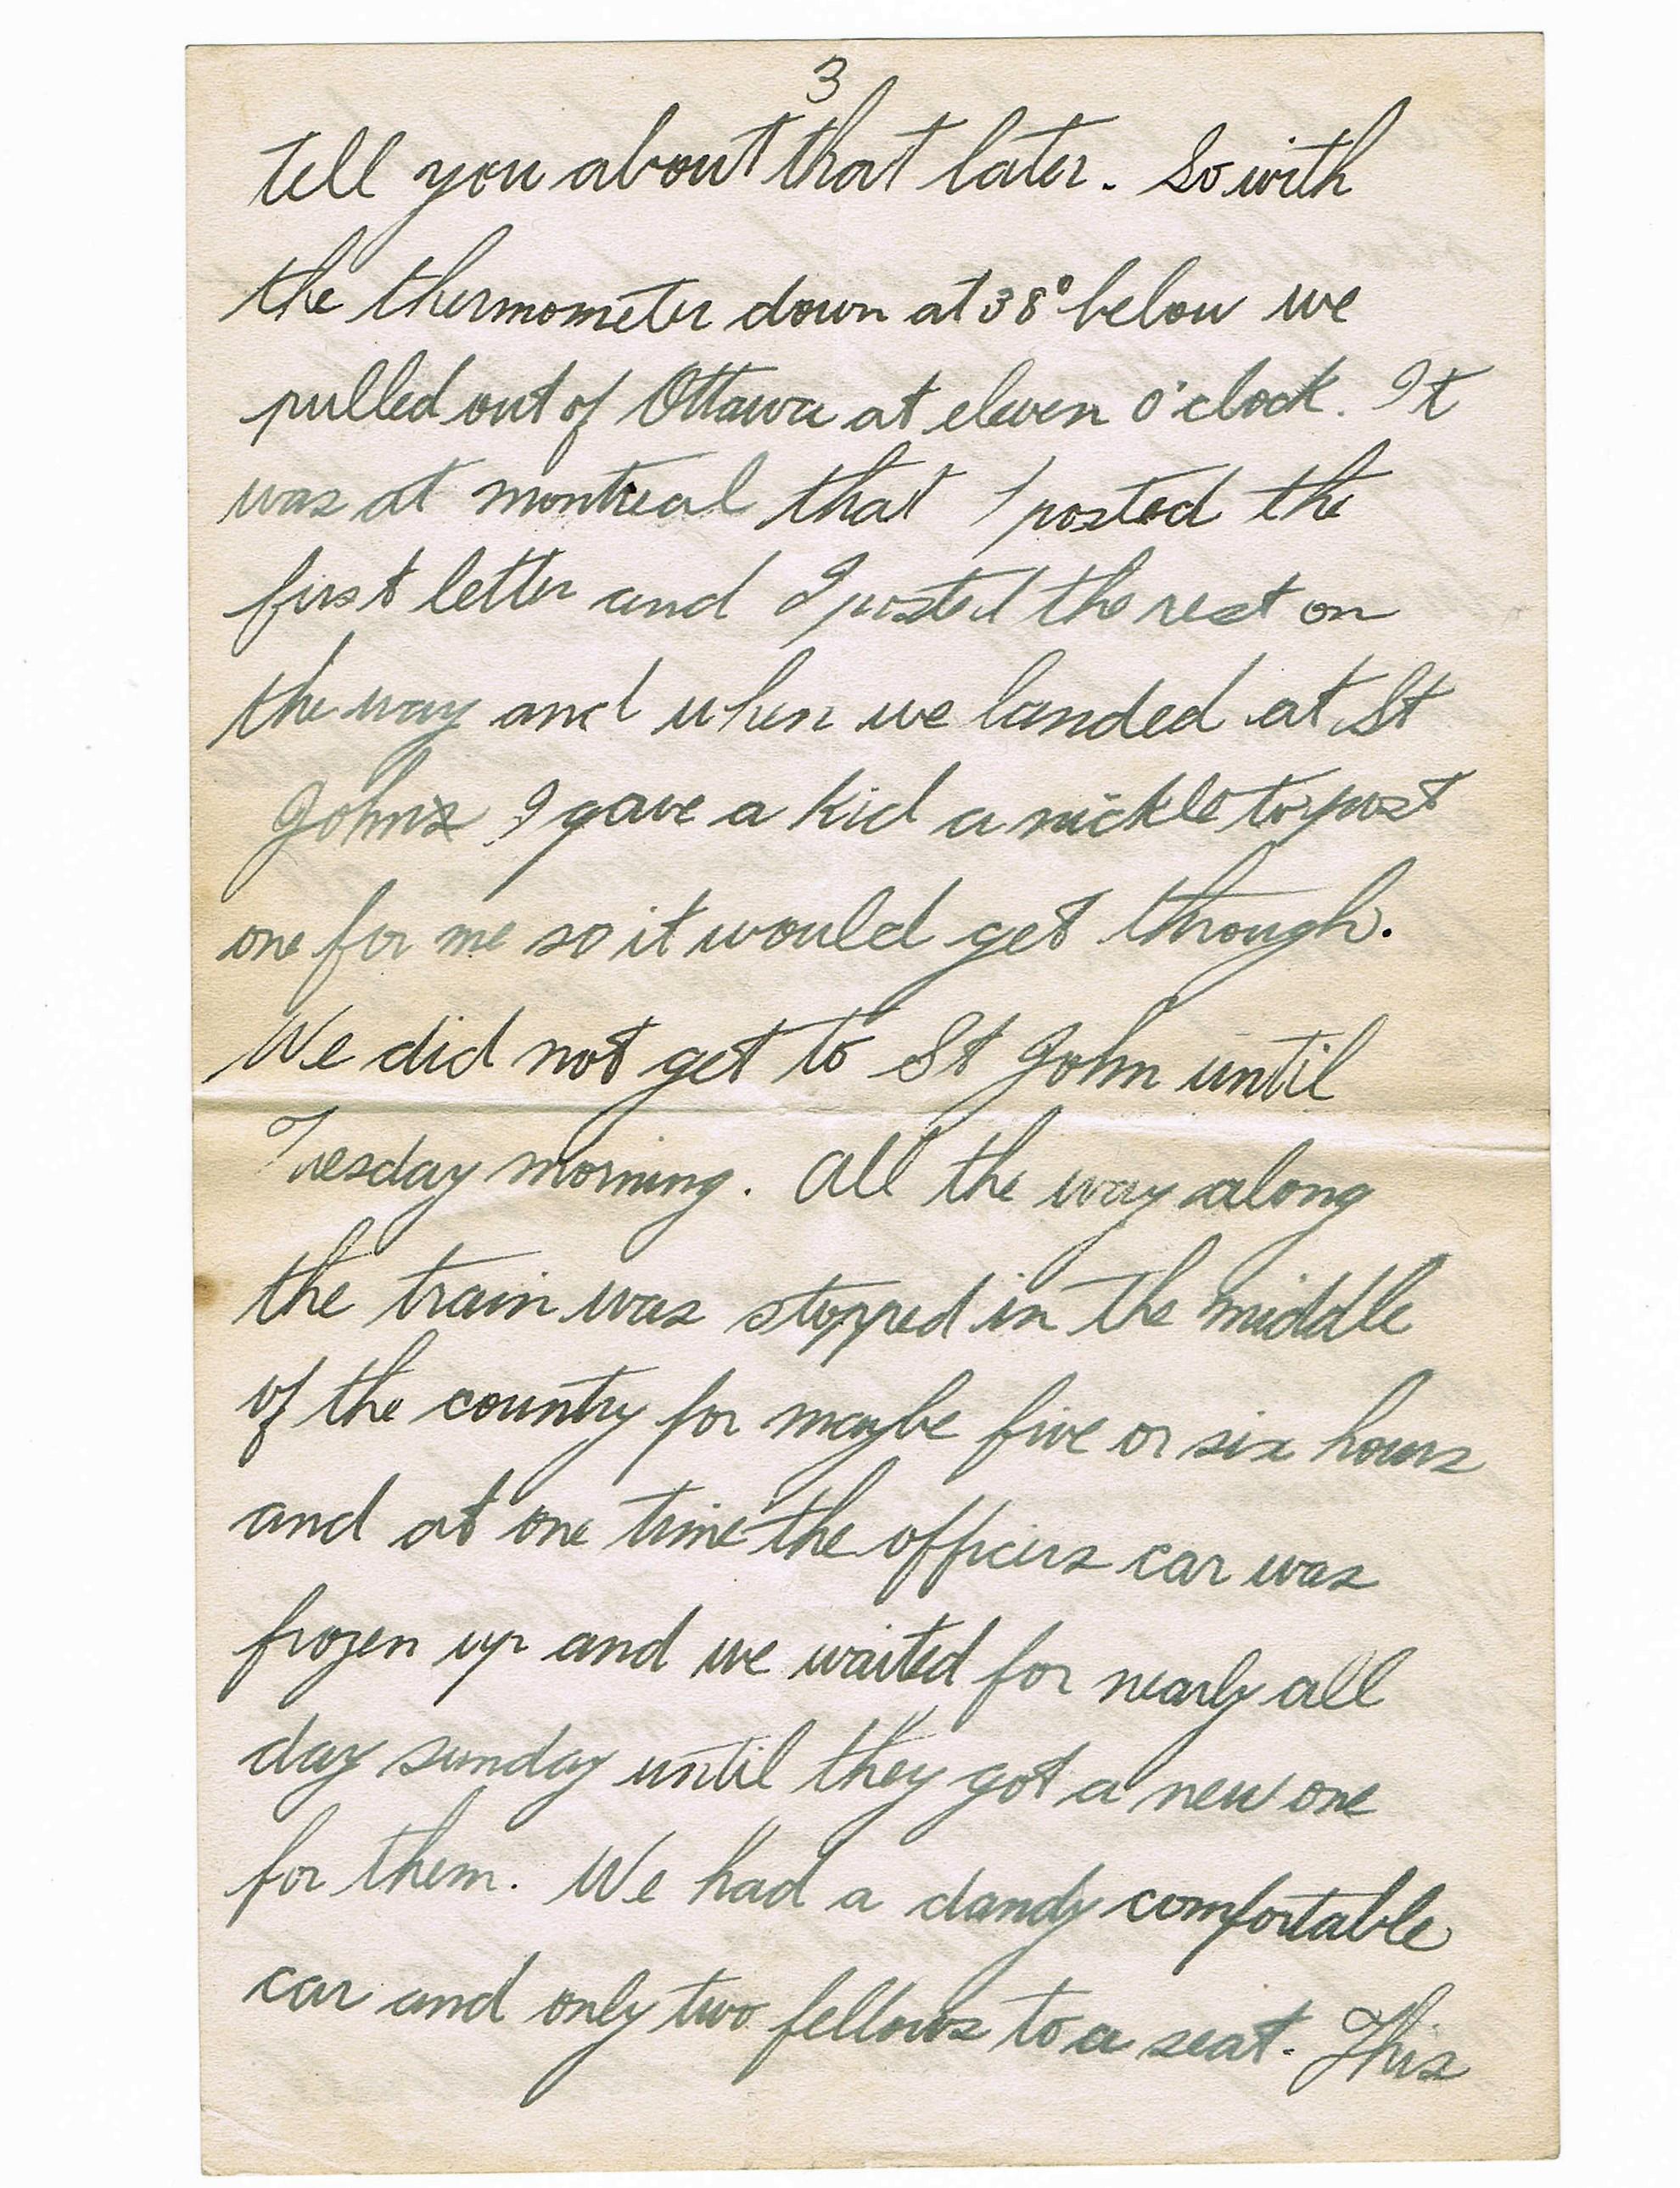 Third page of handwritten letter